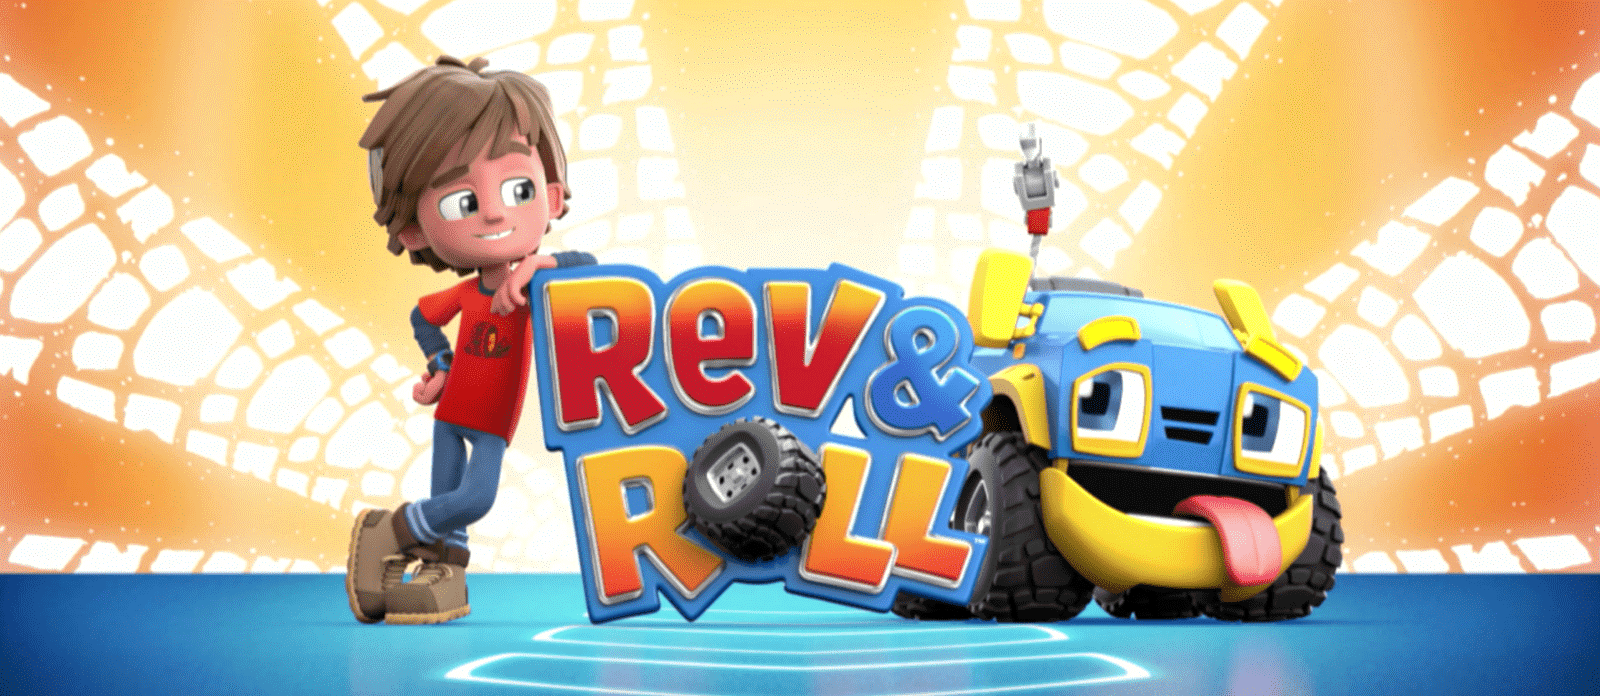 Rev&Roll EU881220 Машинка - Элли